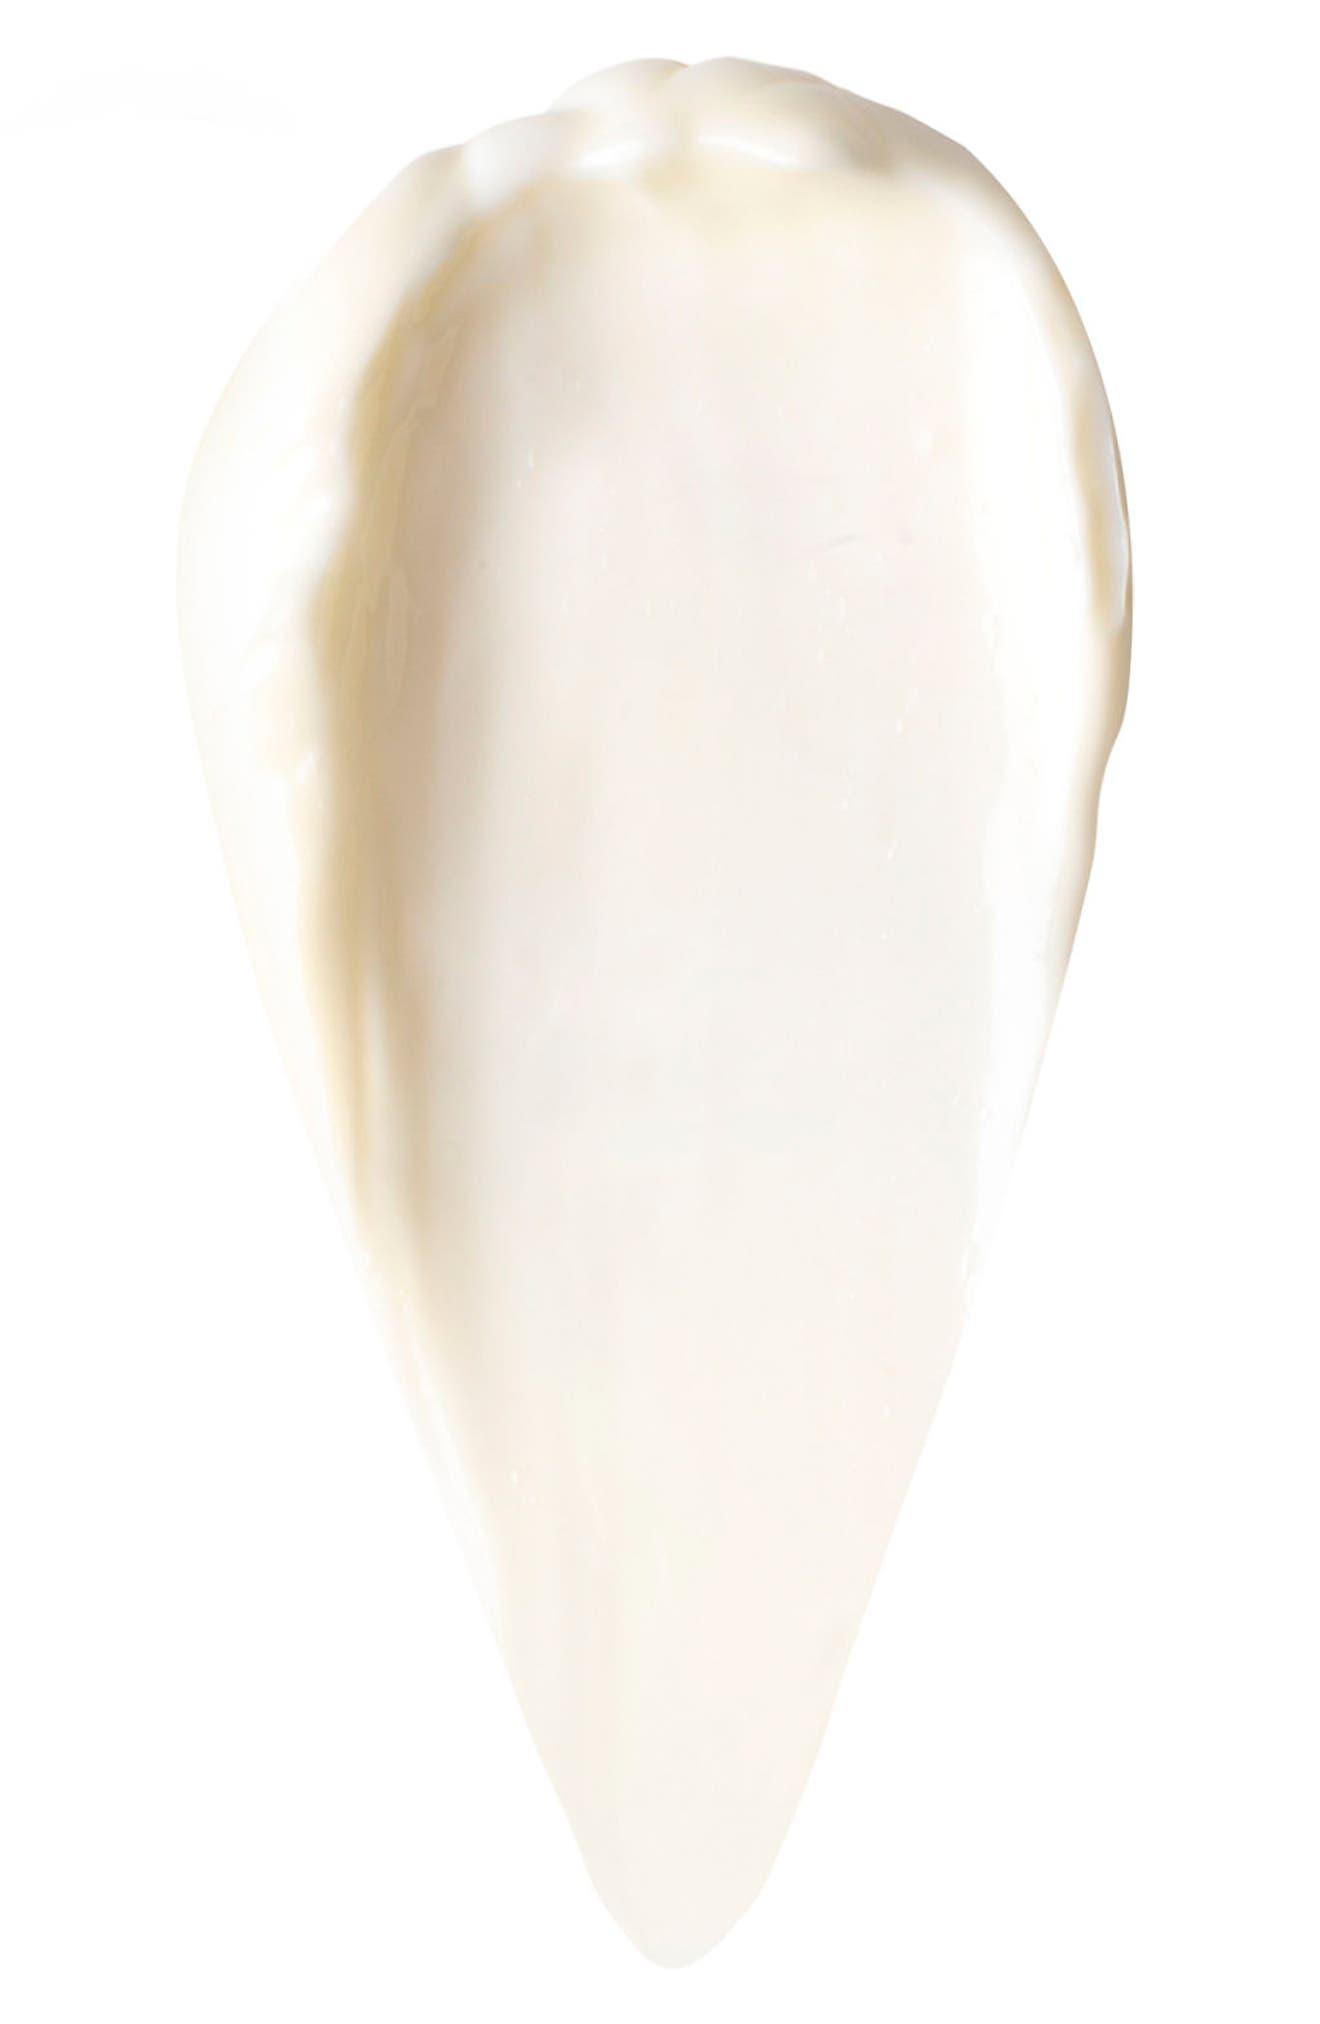 SPACE.NK.apothecary REN Evercalm<sup>™</sup> Global Protection Day Cream,                             Alternate thumbnail 3, color,                             000